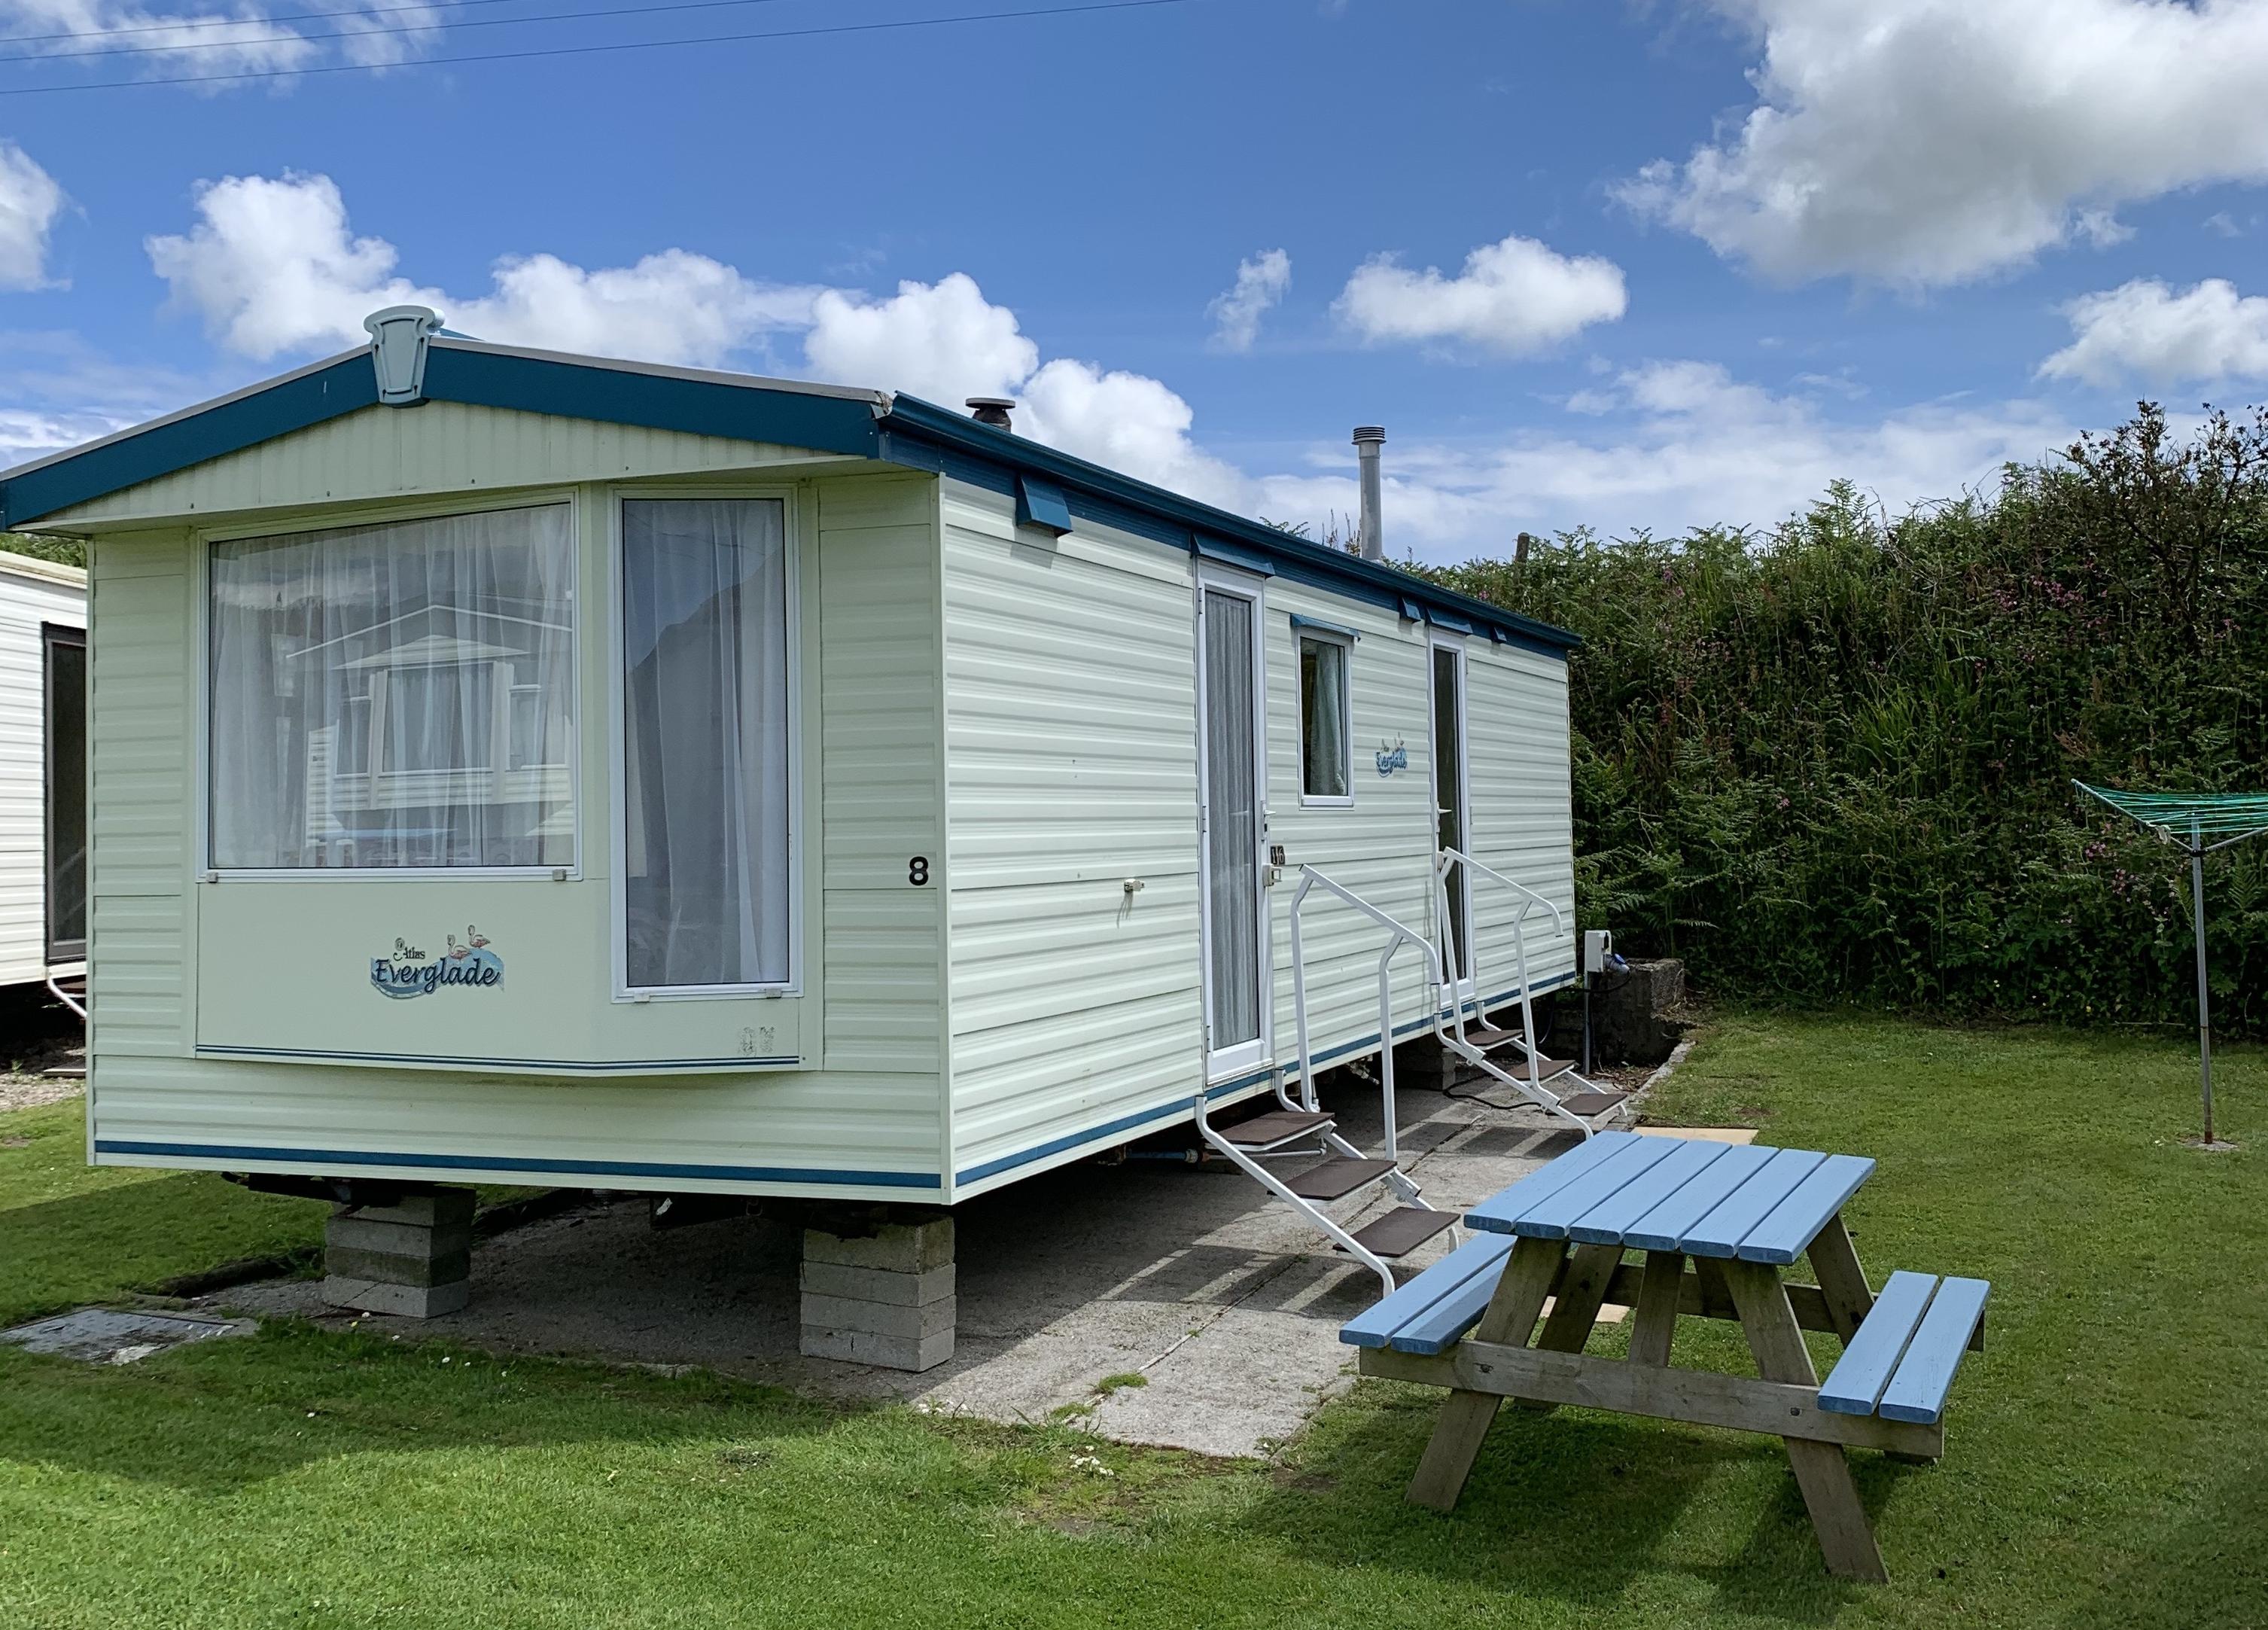 Morvah holiday home 30 x 10 6 berth